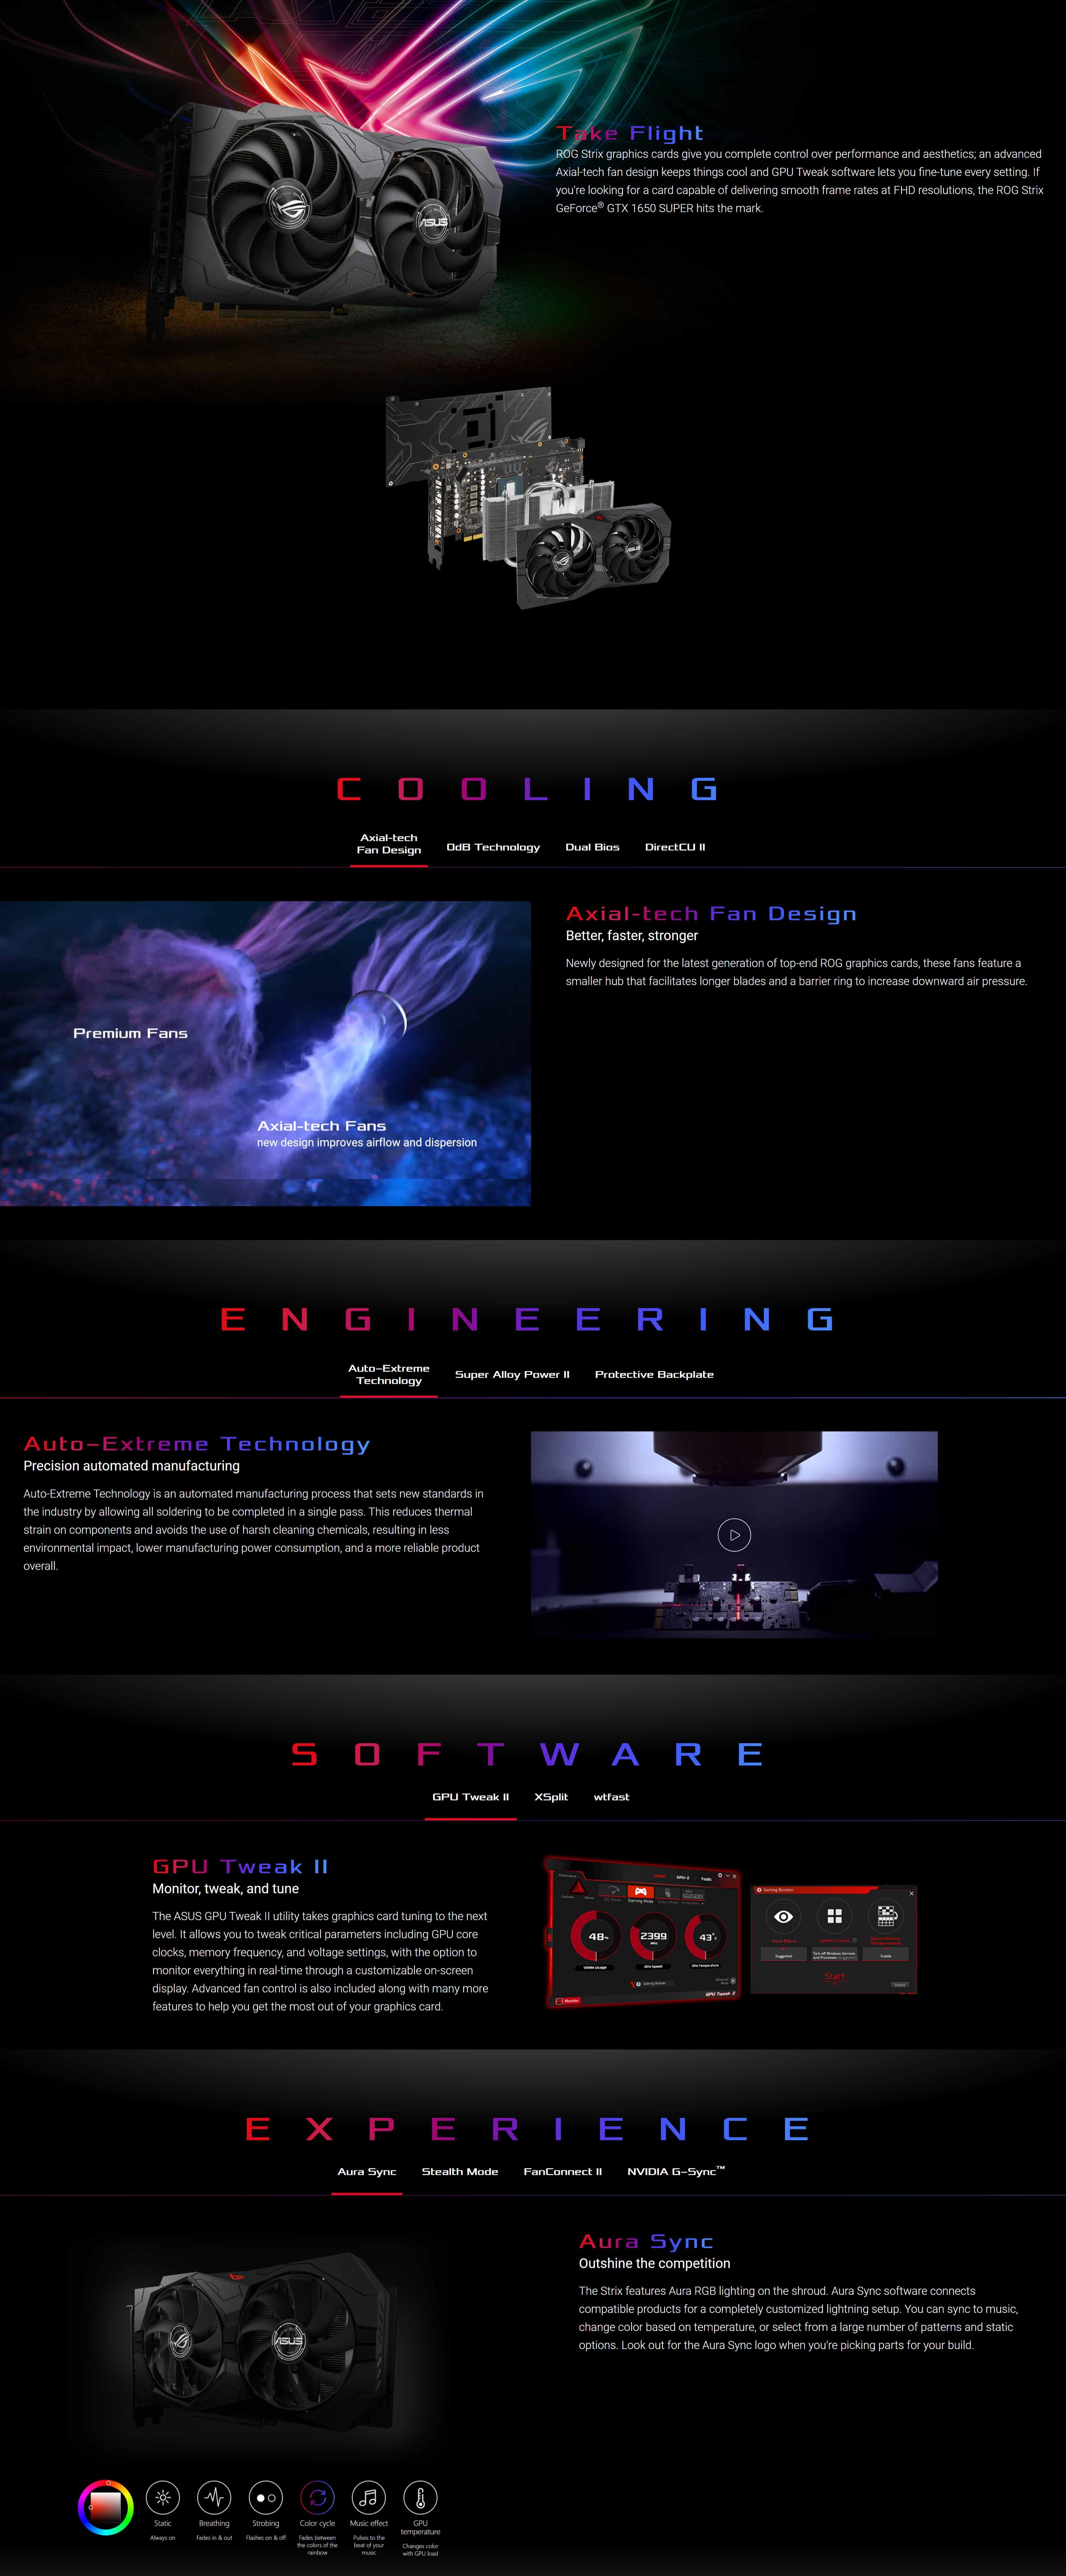 screencapture-asus-Graphics-Cards-ROG-STRIX-GTX1650S-O4G-GAMING-2020-06-18-14_29_53.jpg